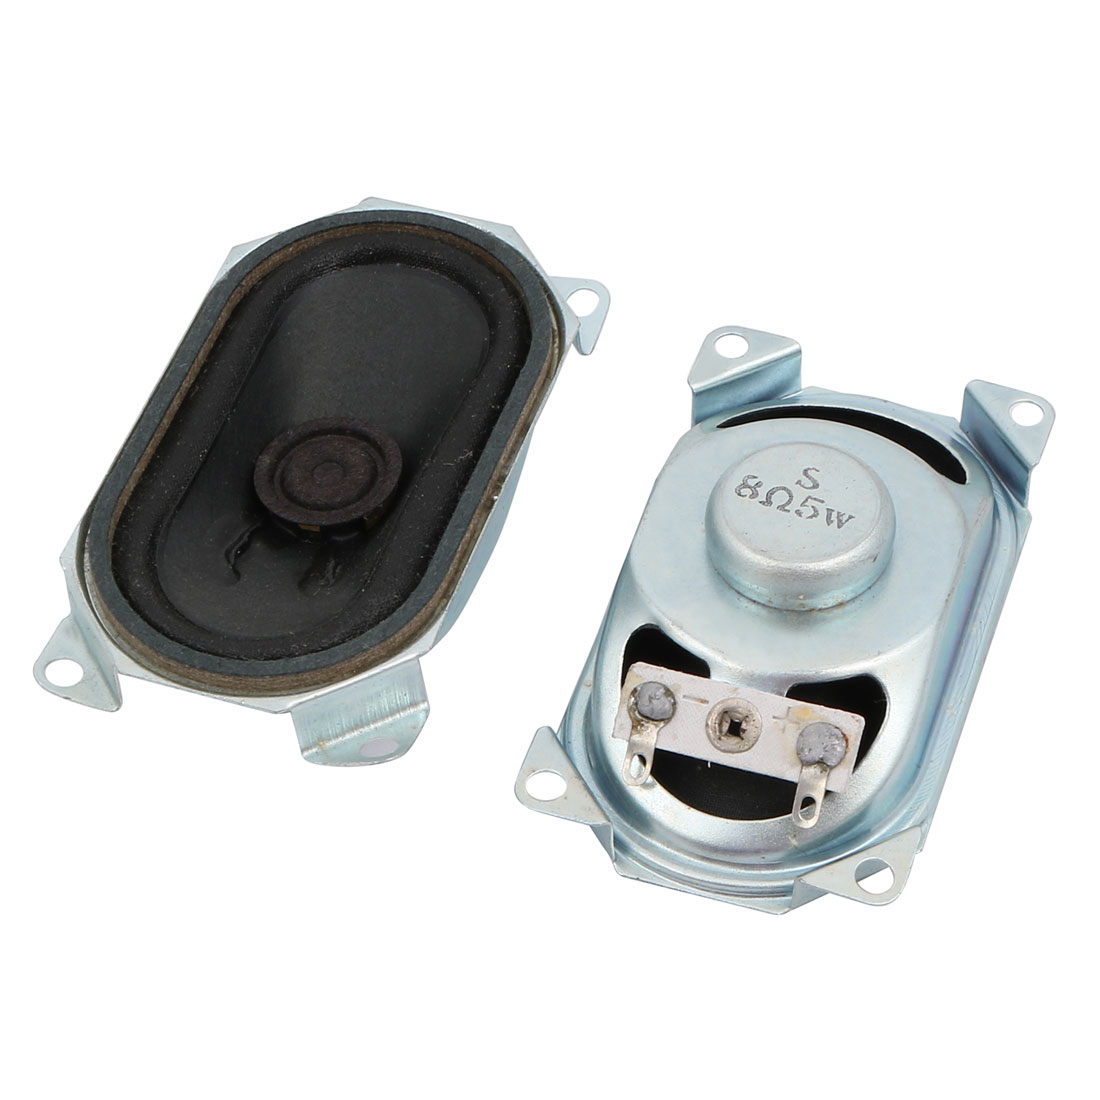 2Pcs 8 Ohm 5W 73mmx41mmx23mm Slim Internal Magnet Speaker for Toys